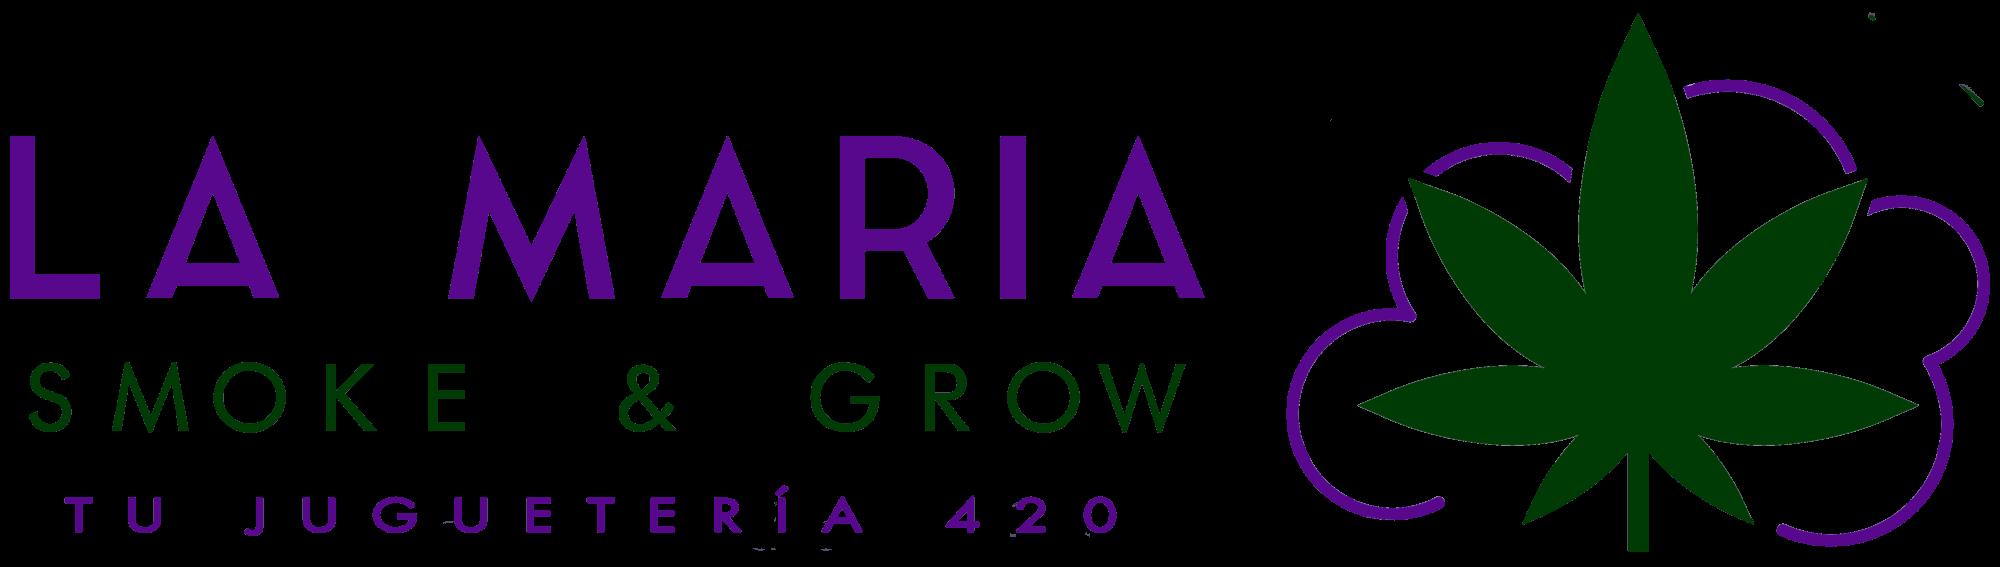 La Maria Smoke & Grow